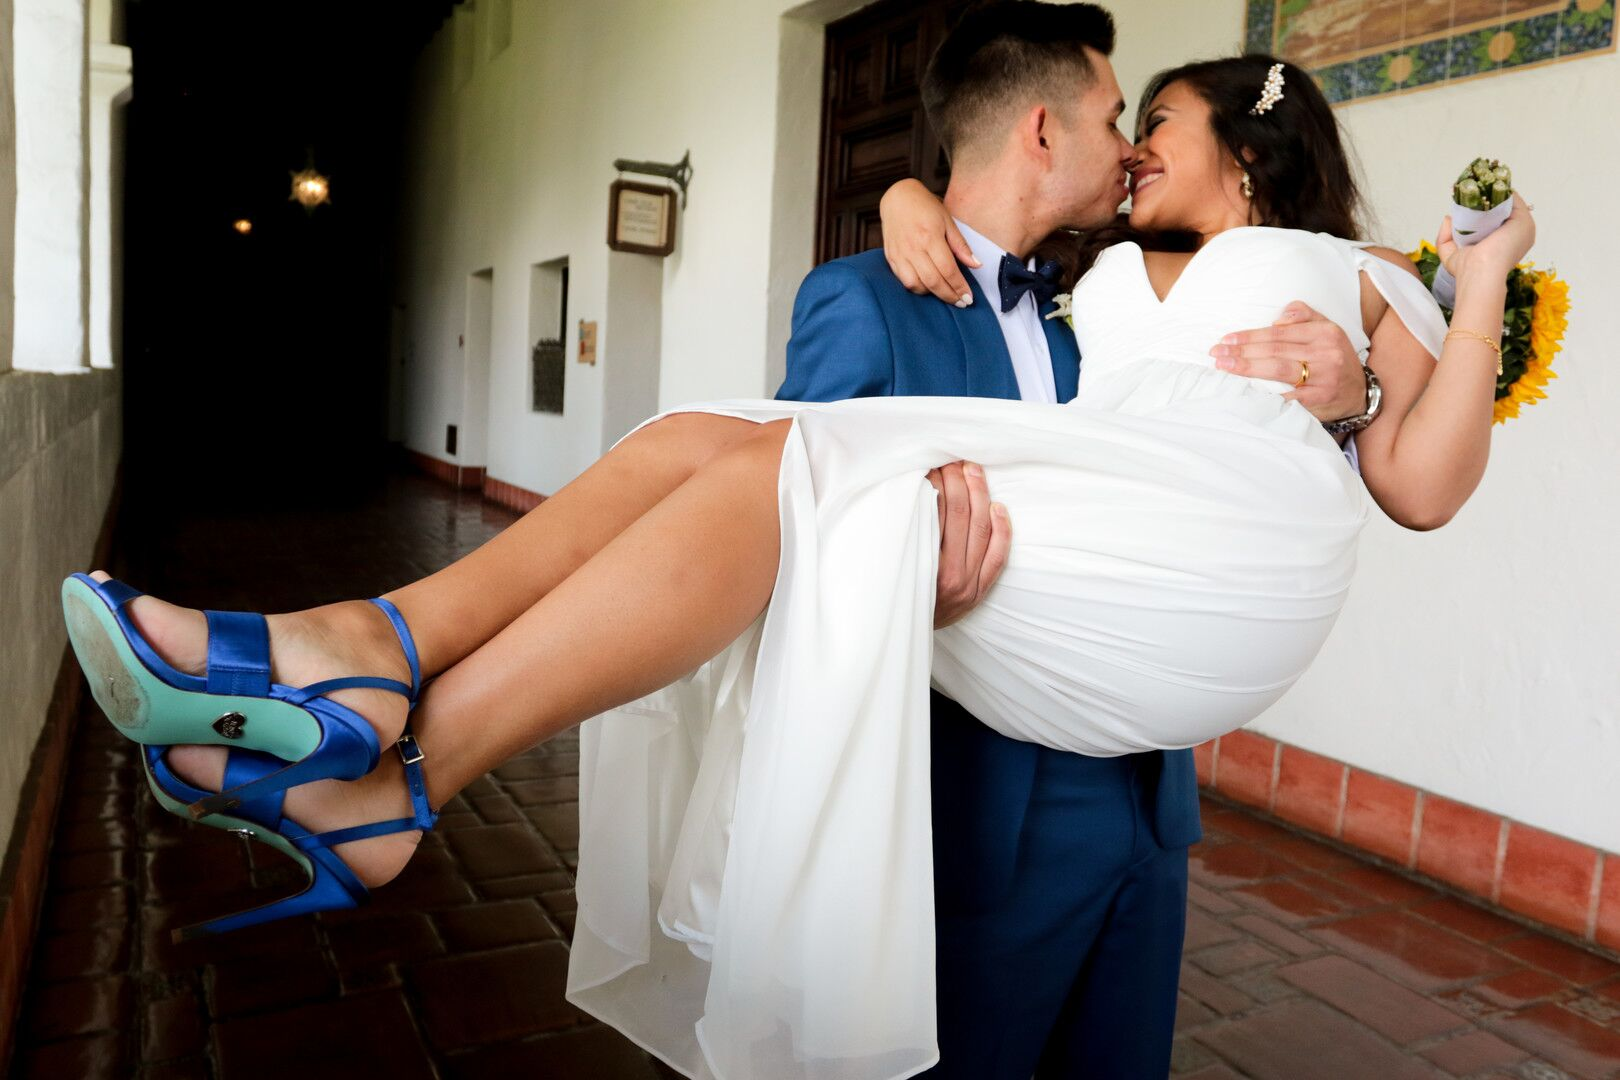 www.santabarbaraweddings.com | Photographer: Trista Maja Photography | Venue: Santa Barbara Courthouse | Wedding Dress: Lulus | Hair: Legends Hair | Groom Carrying Bride